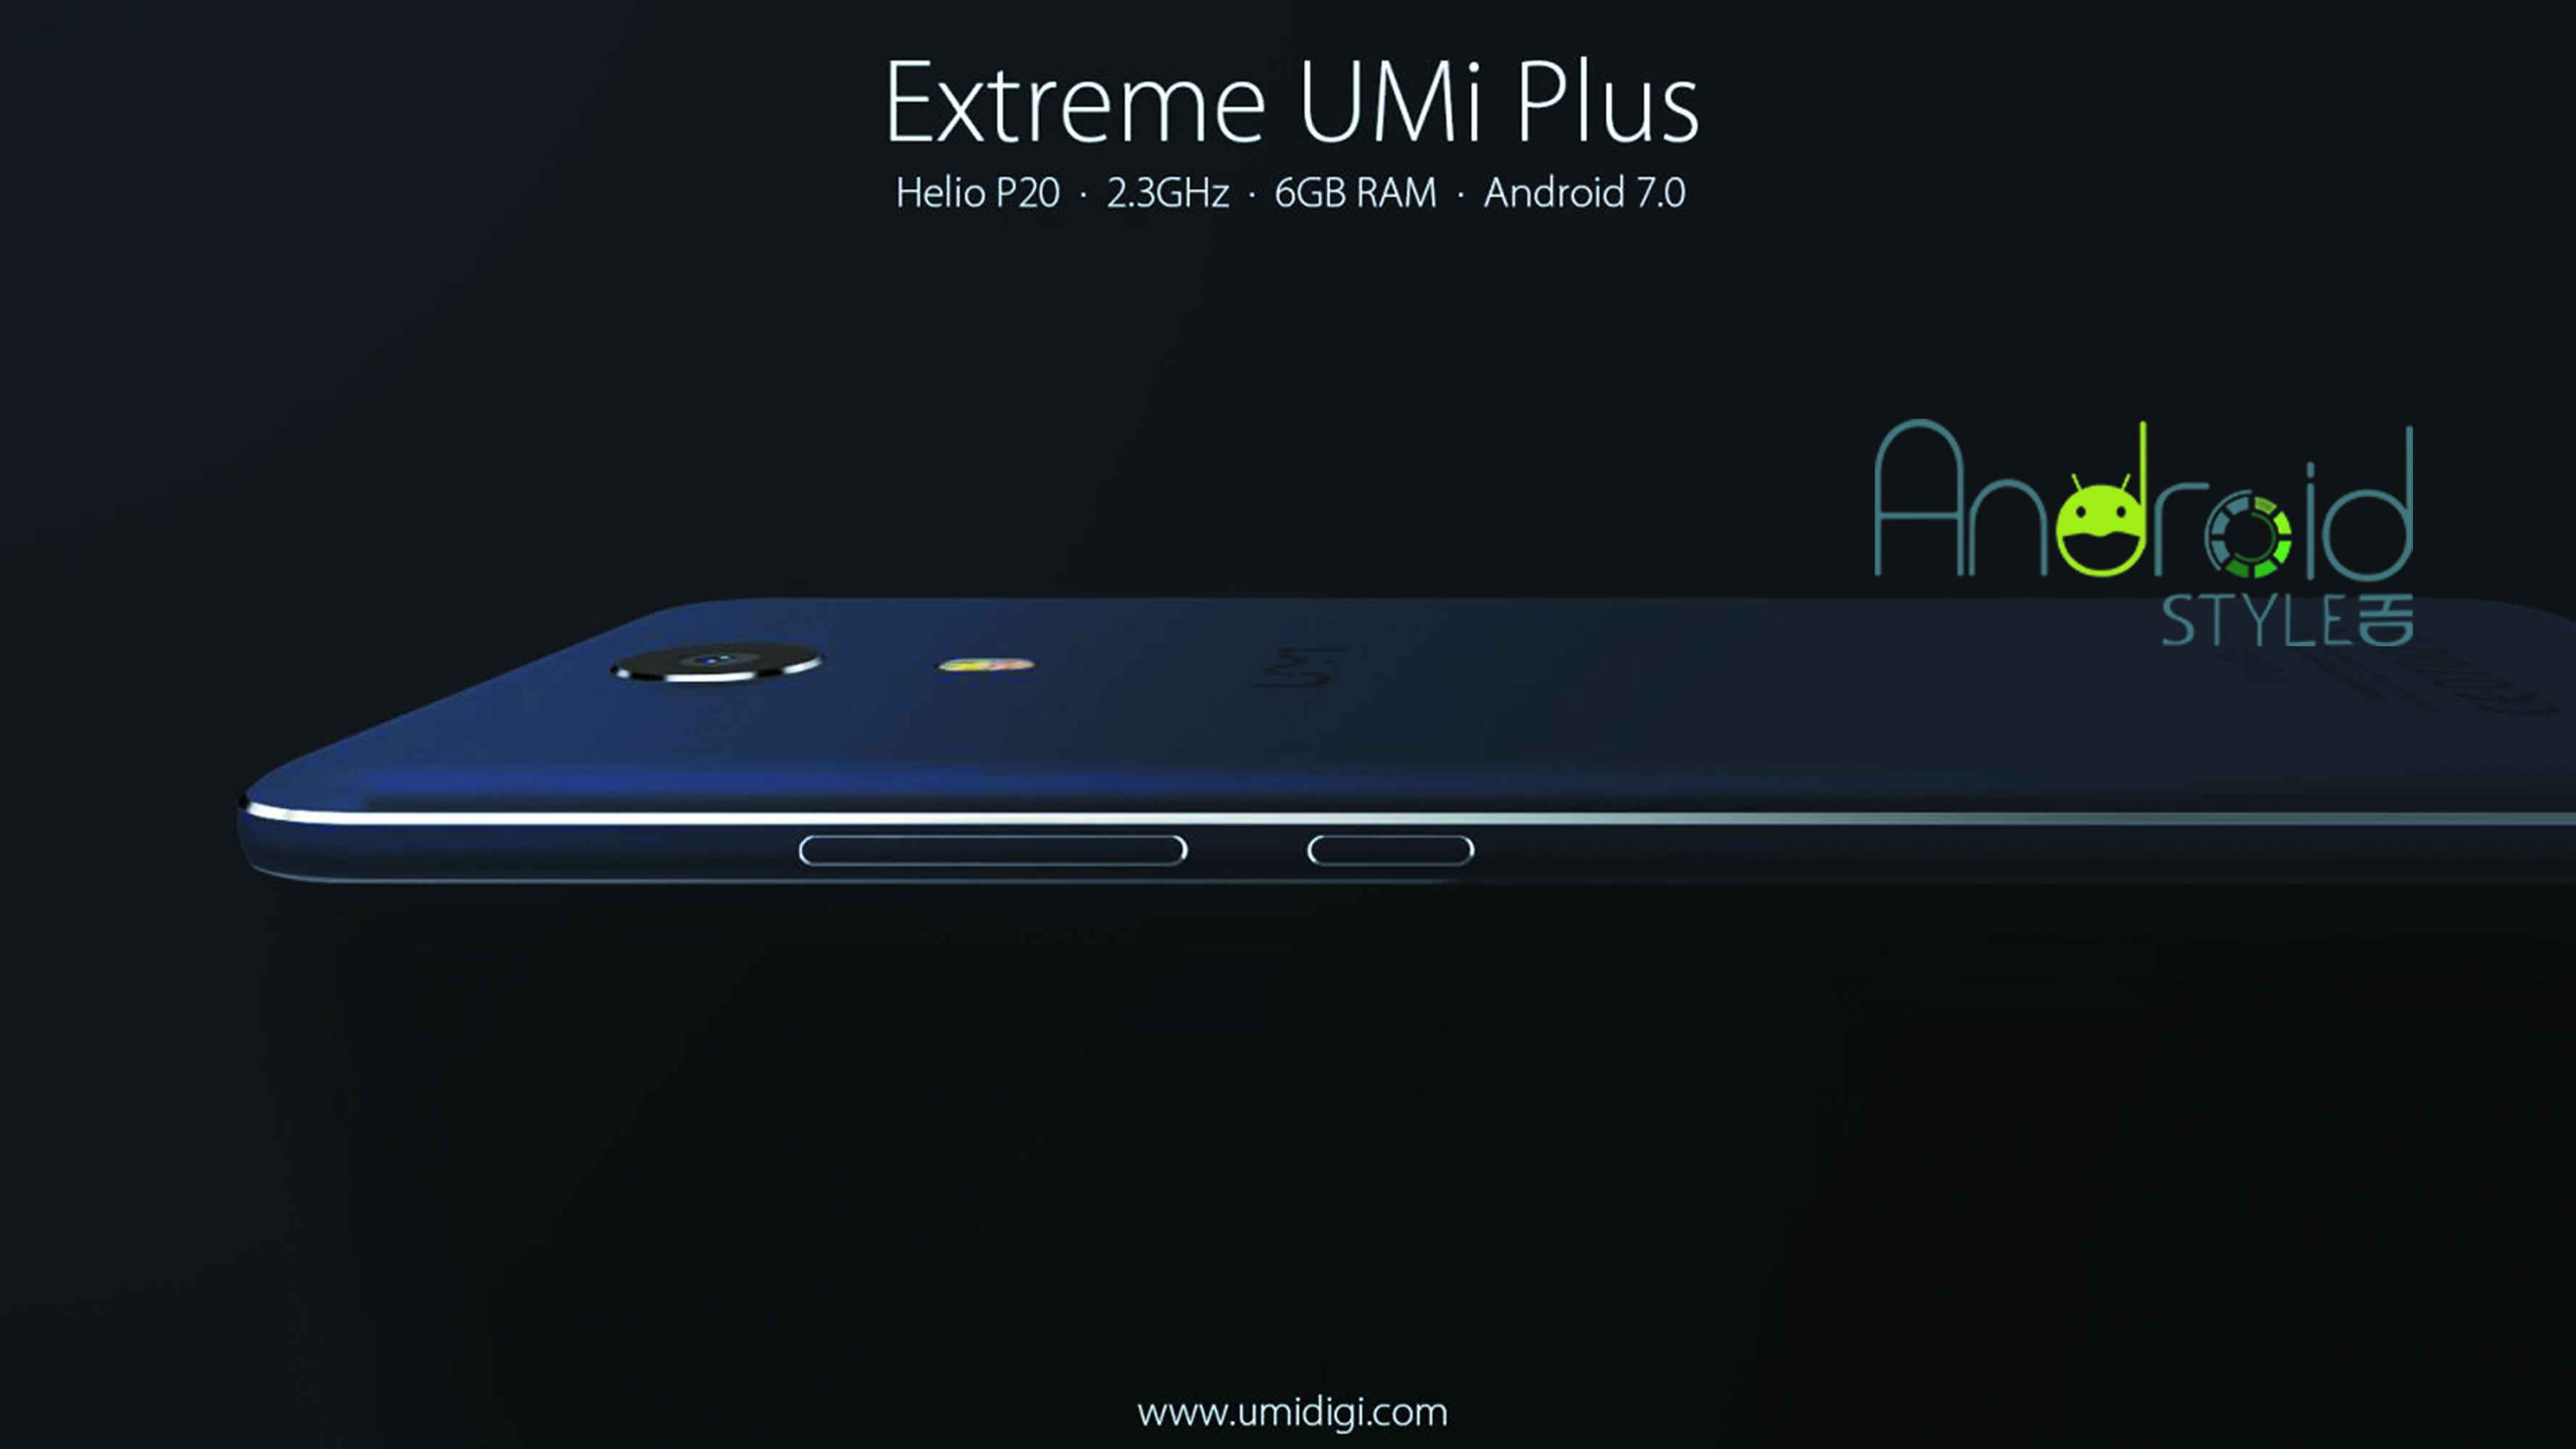 UMi Plus Extreme: Annunciata una versione Extreme di UMi Plus